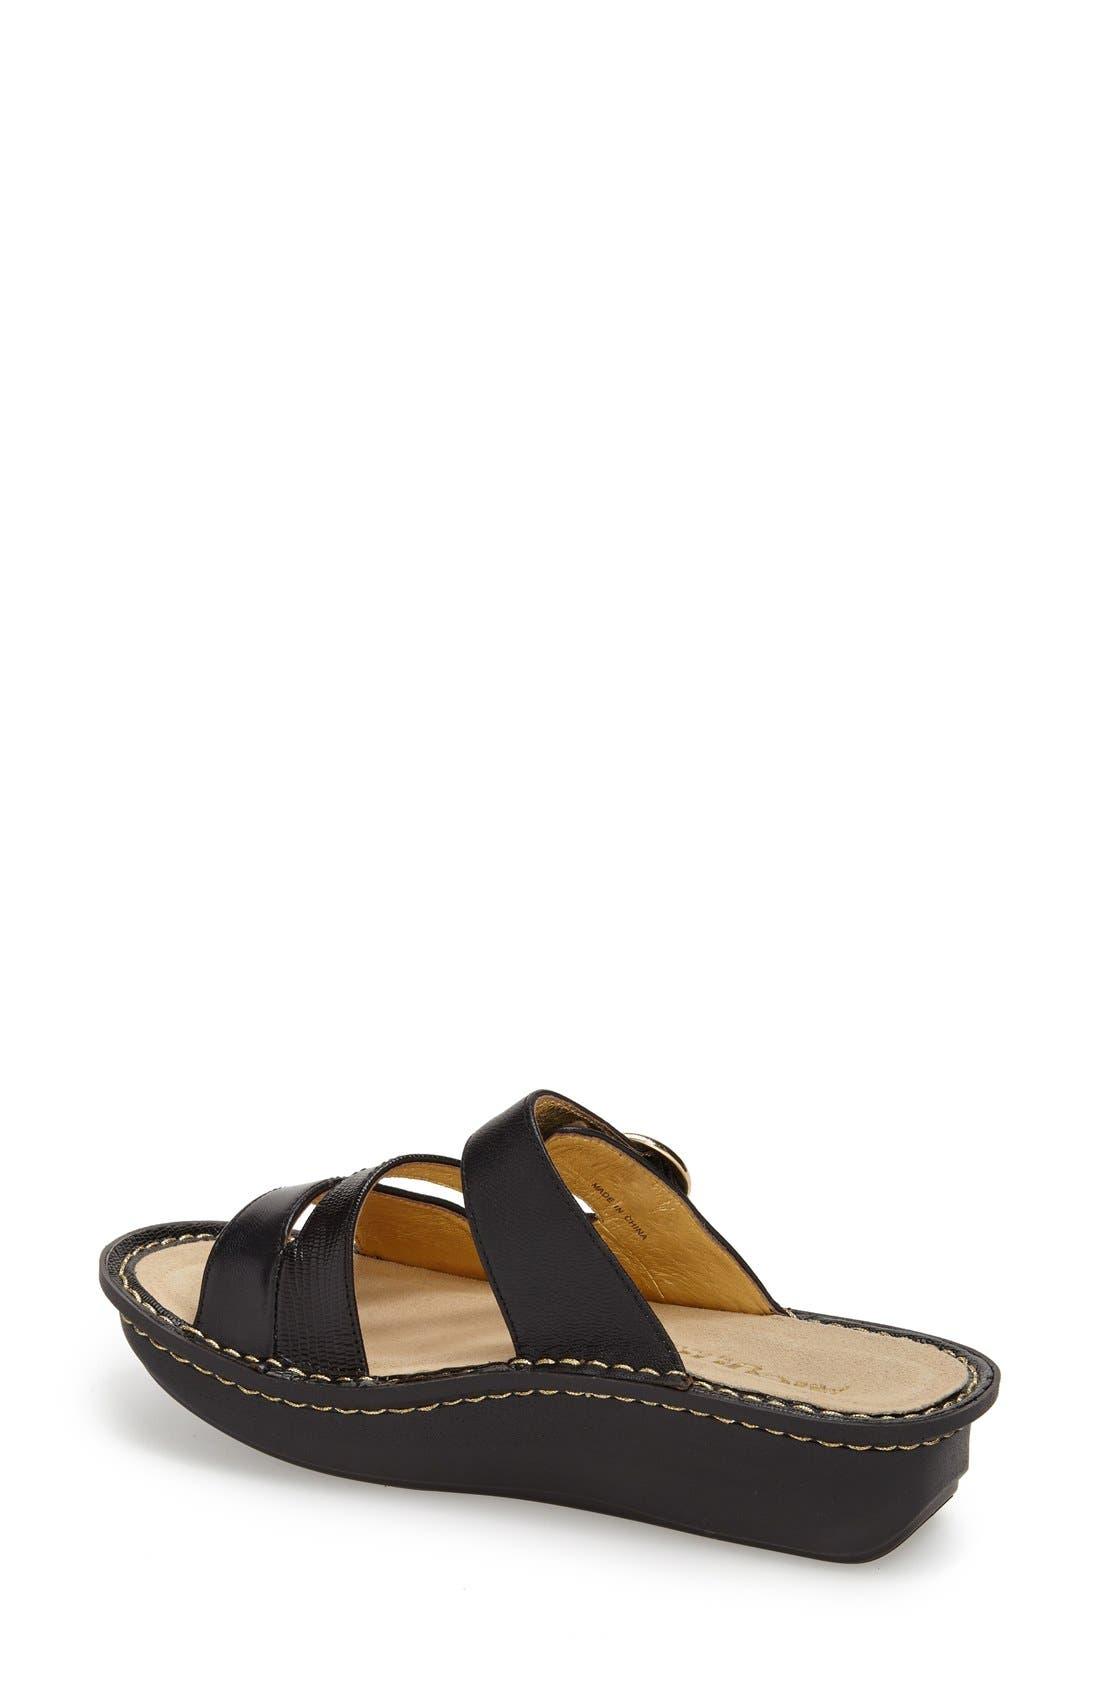 'Colette' Platform Sandal,                             Alternate thumbnail 36, color,